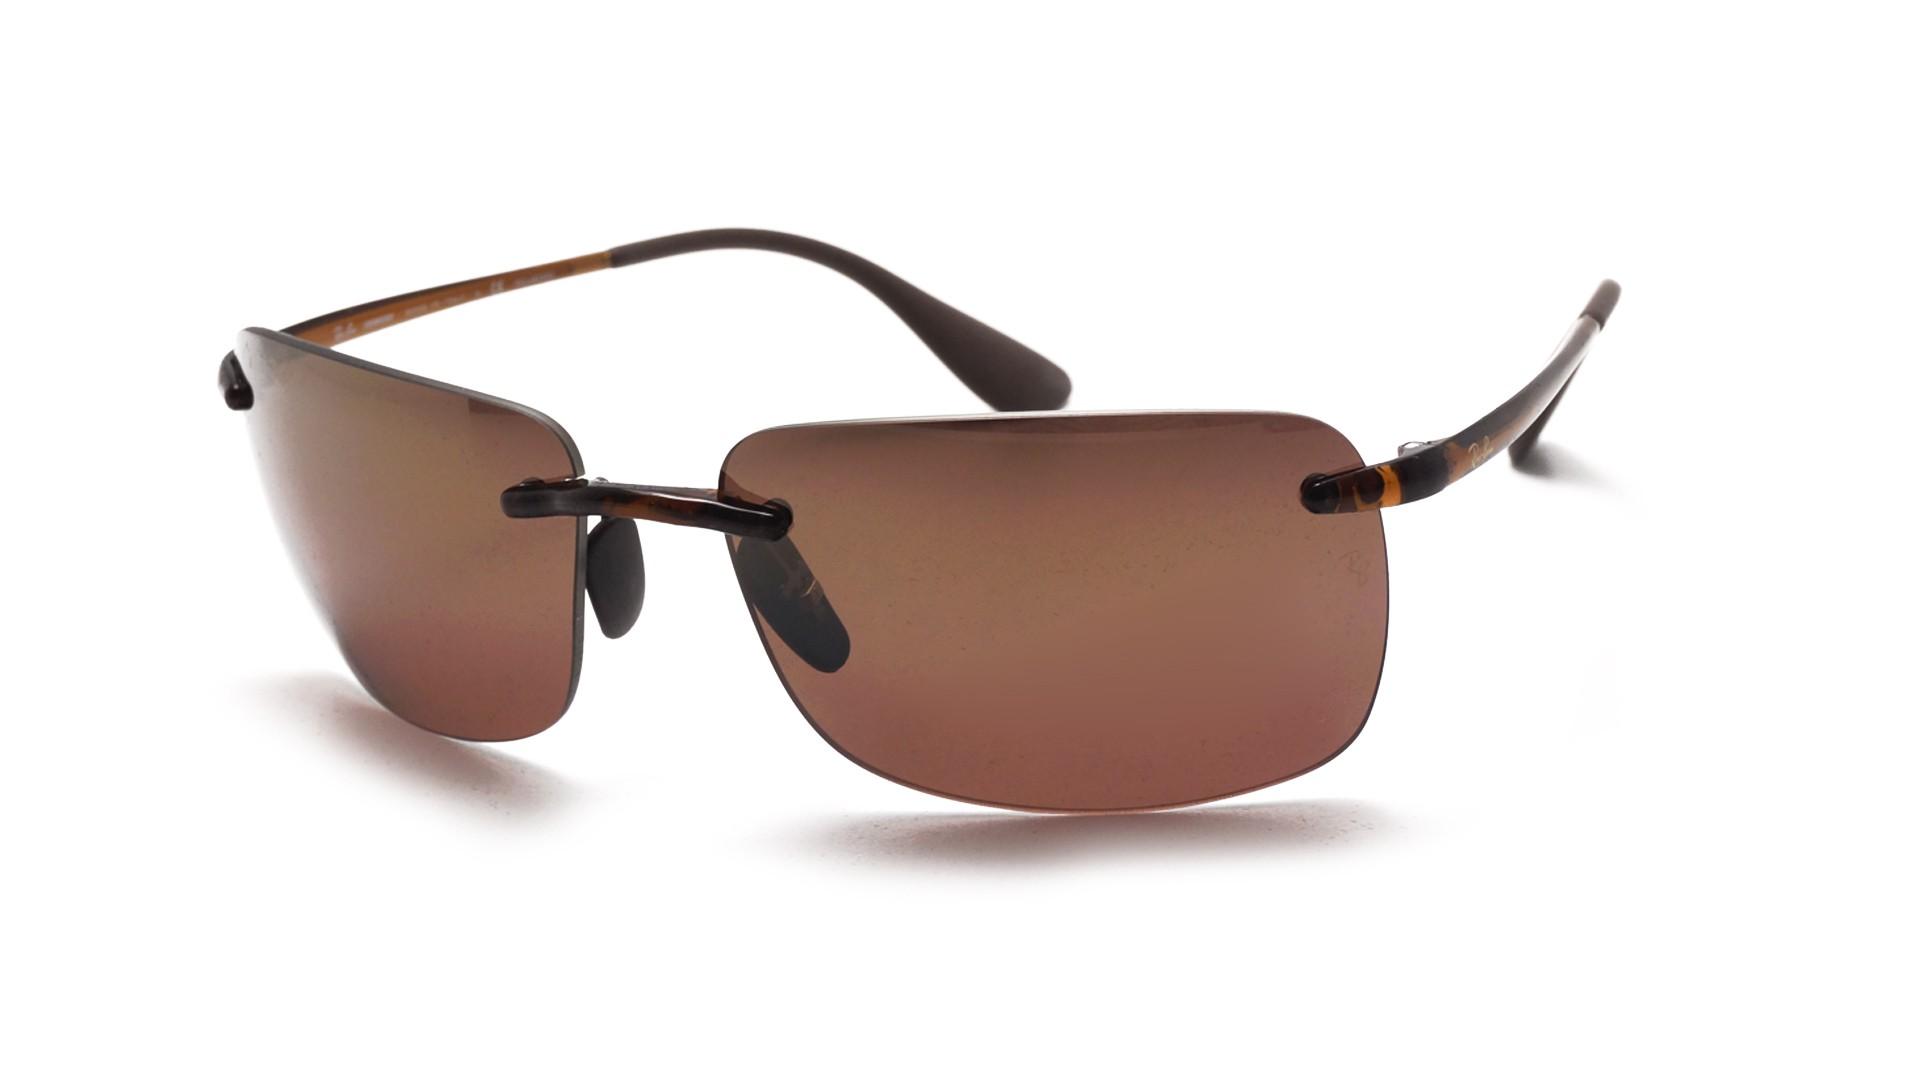 4e65ccc0ba4 Ray-Ban Tech Chromance Brown RB4255 604 6B 60-15 Polarized .. Sunglasses ...